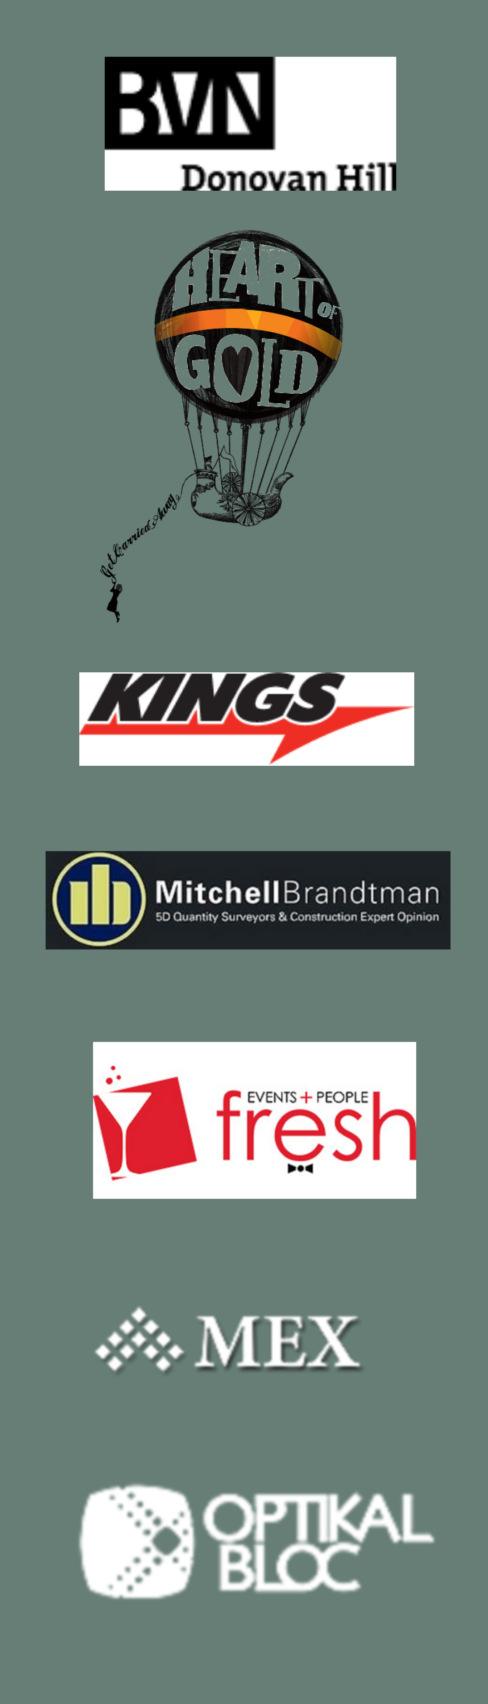 VCHB Clients logos Left